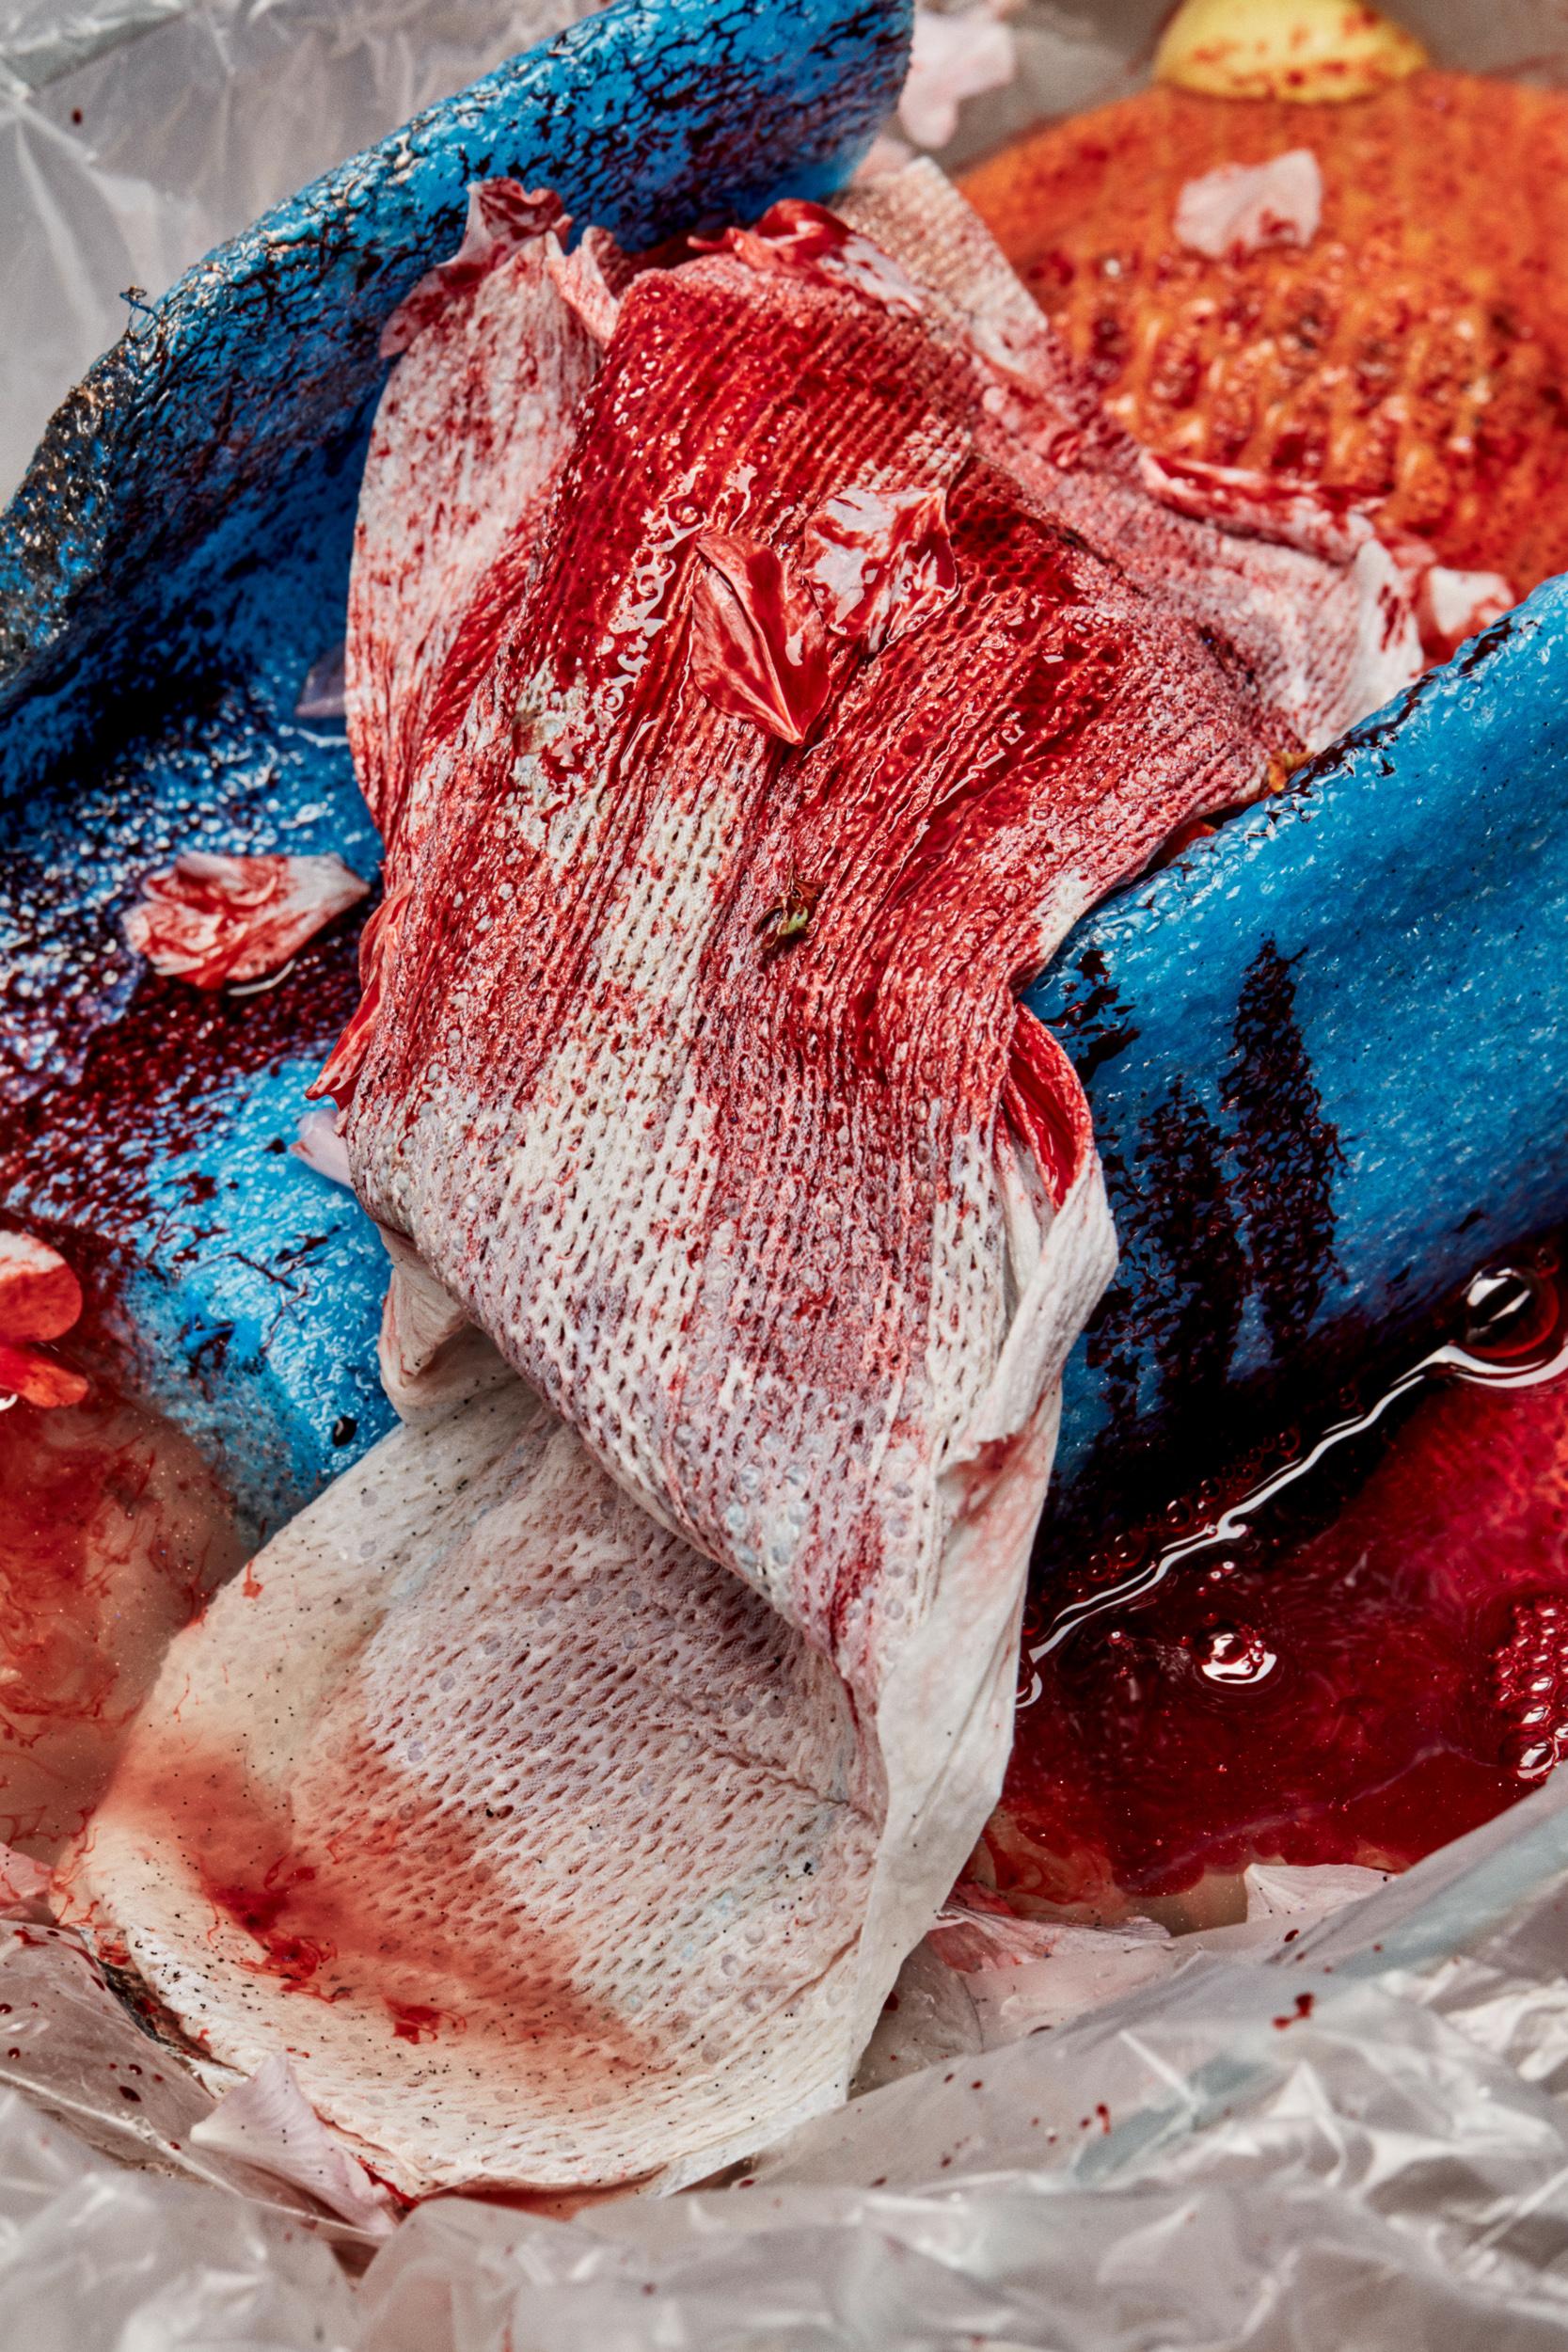 Bleeding into the Ocean (Equals 4 Plastic Bags)